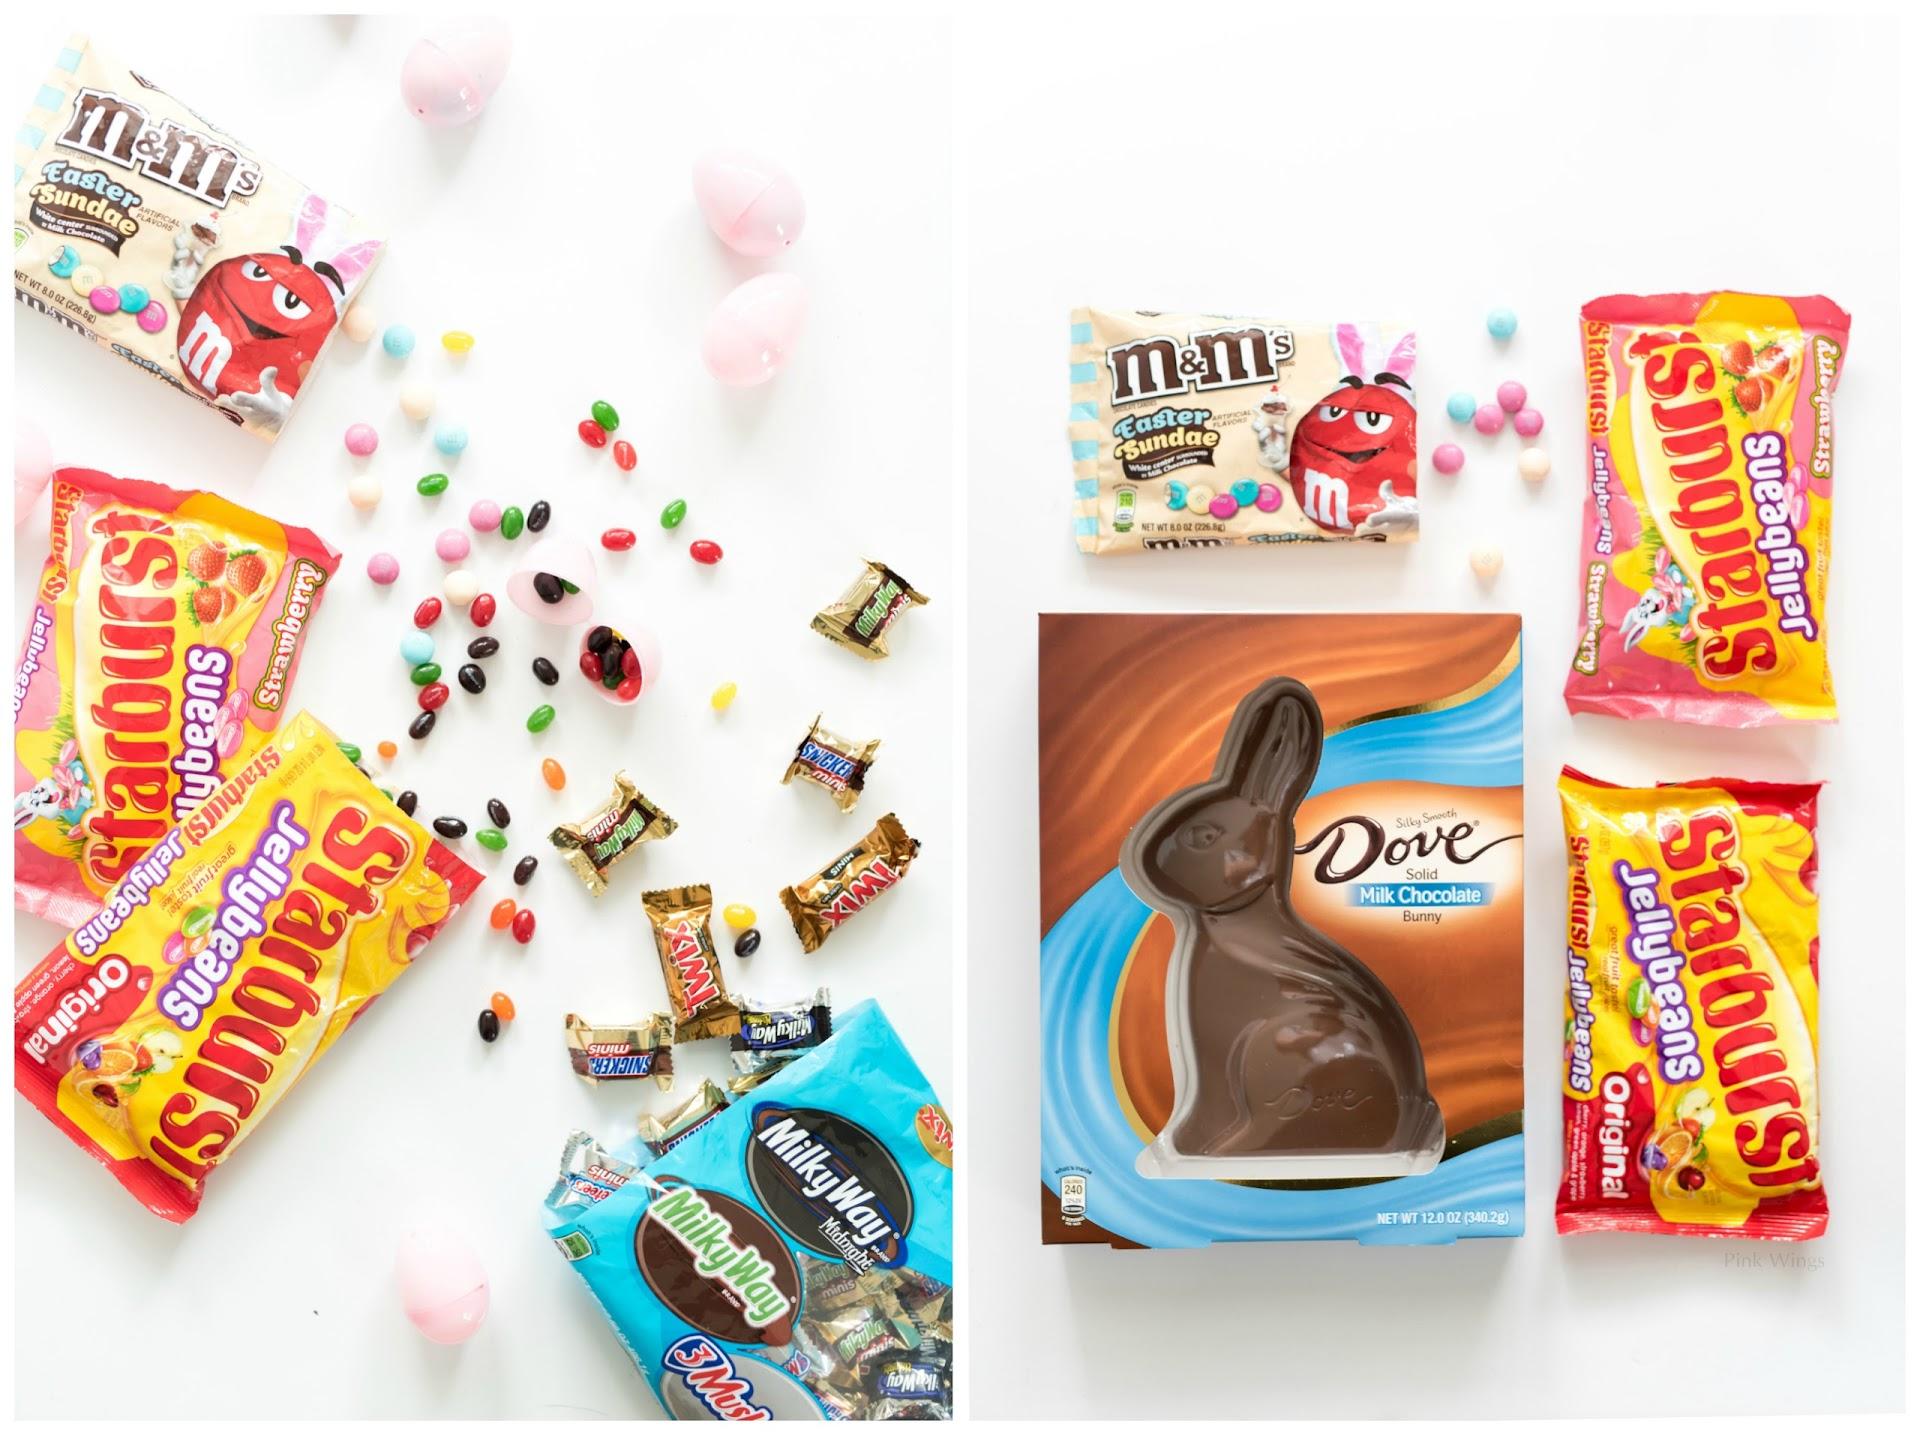 Easter candy ideas, easter basket fillers, easter basket ideas for adults, kids, teenagers, men